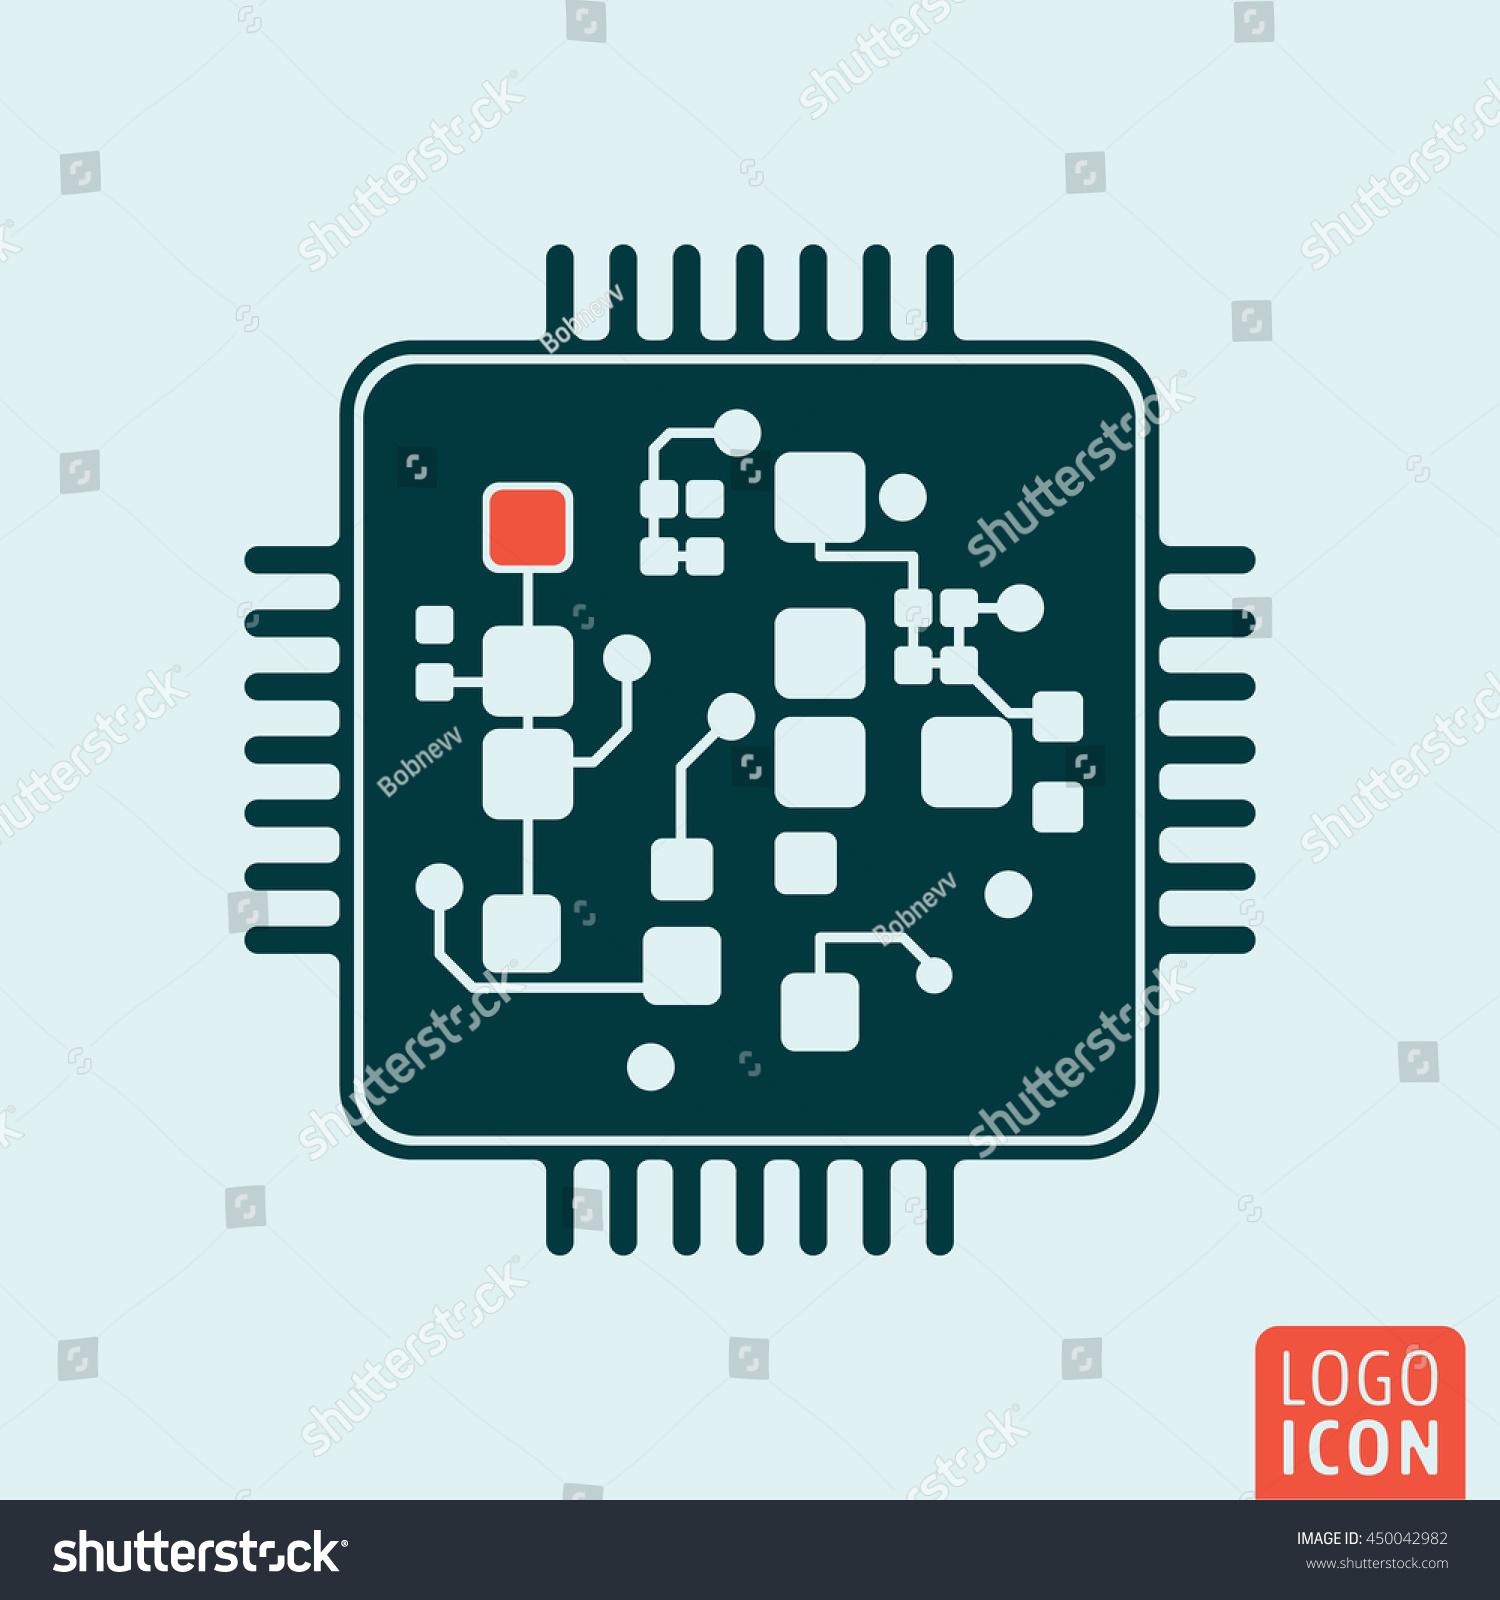 Computer Chip Icon Circuit Board Technology Stock Vector Royalty Apple Circuitboard Clock Vintage Clocks Symbol Illustration